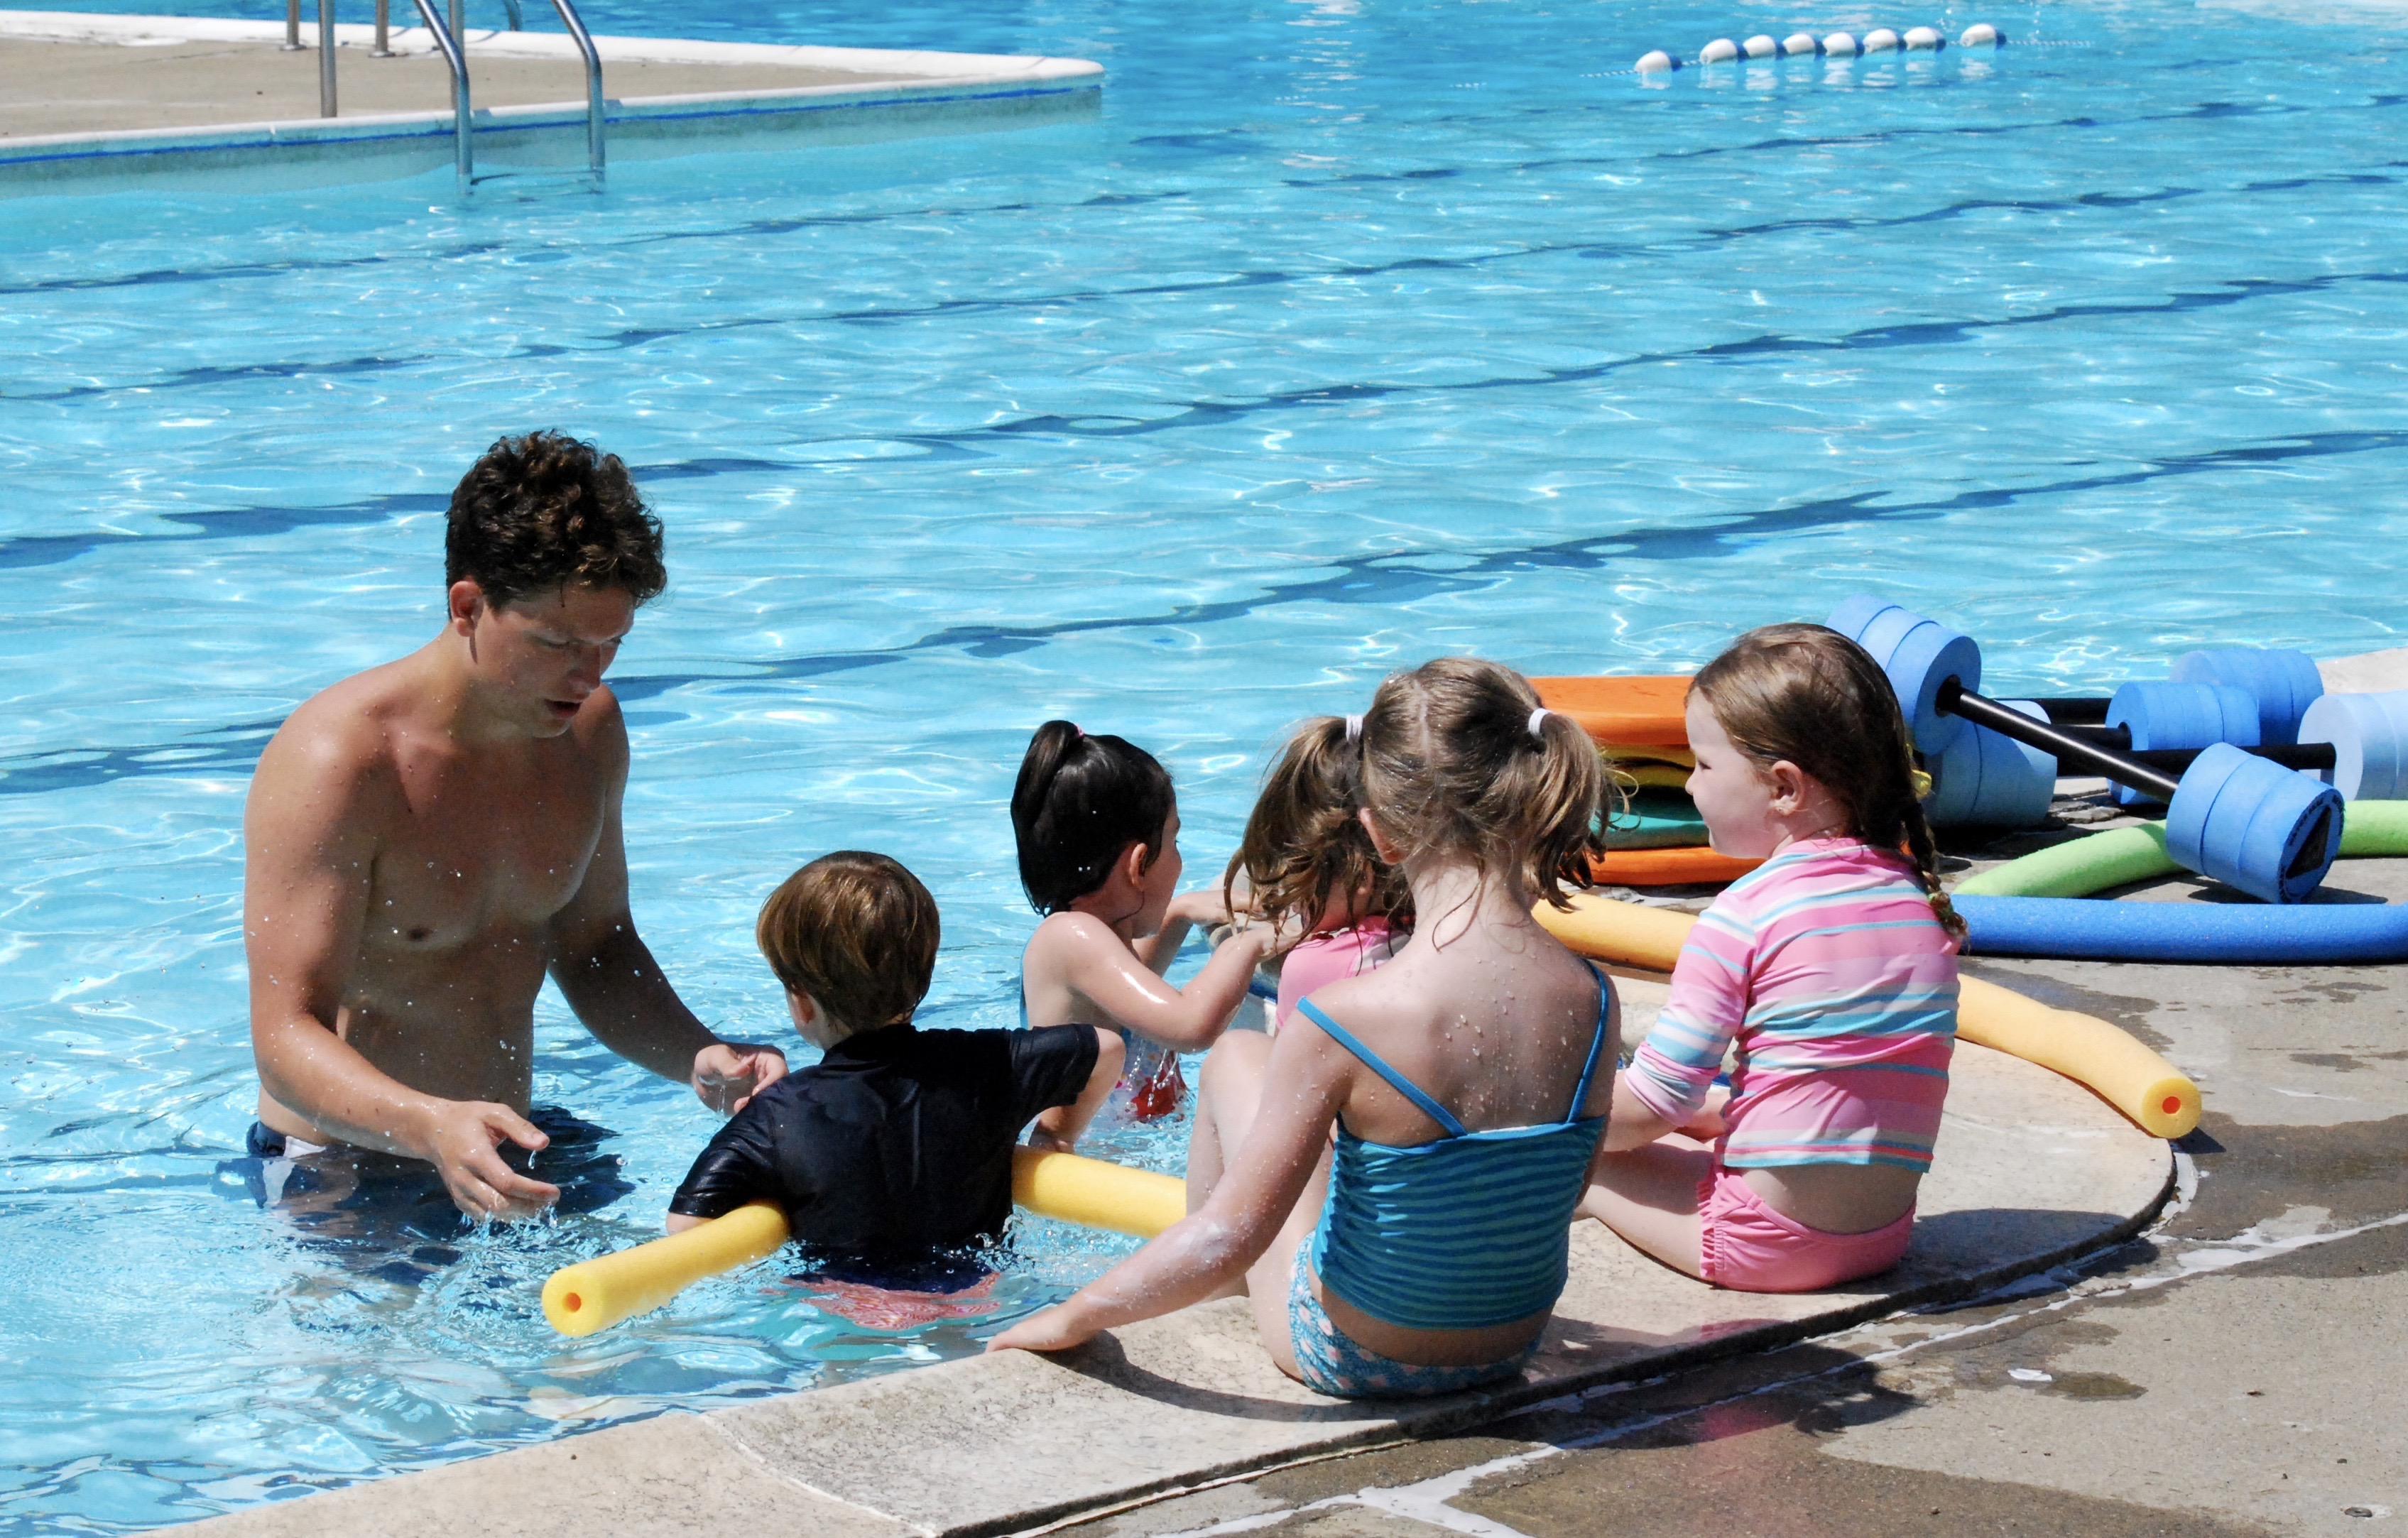 Swim lessons gear clipart clipart free download Zena Recreation Park, Inc. - Swim Lessons clipart free download